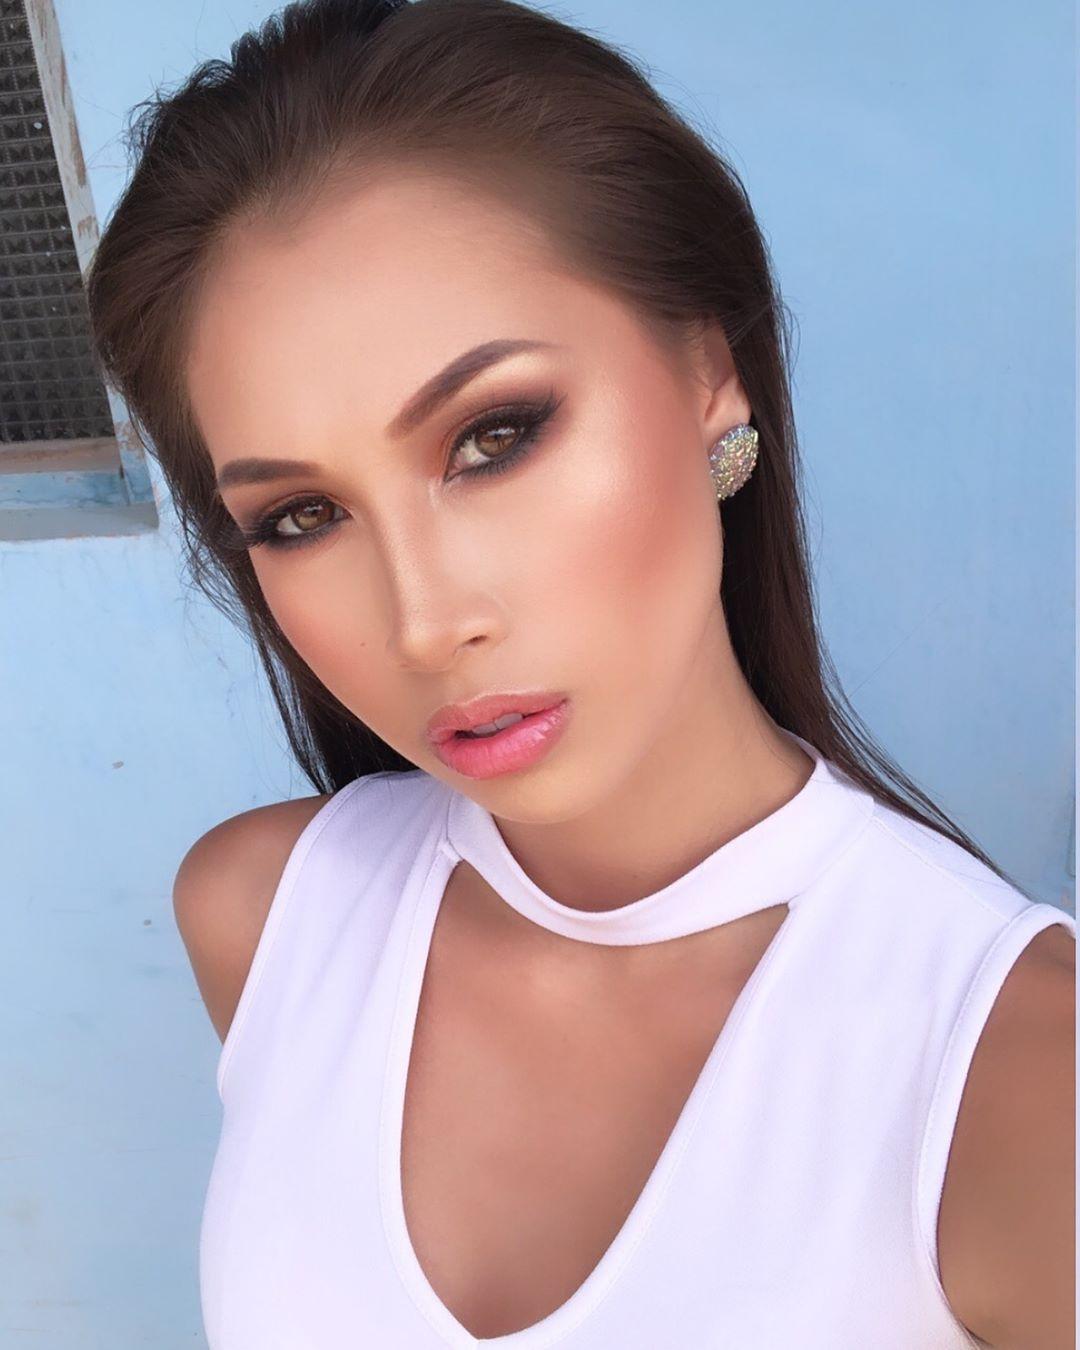 yoko chong, 4th runner-up de miss intercontinental 2019. - Página 2 51844813